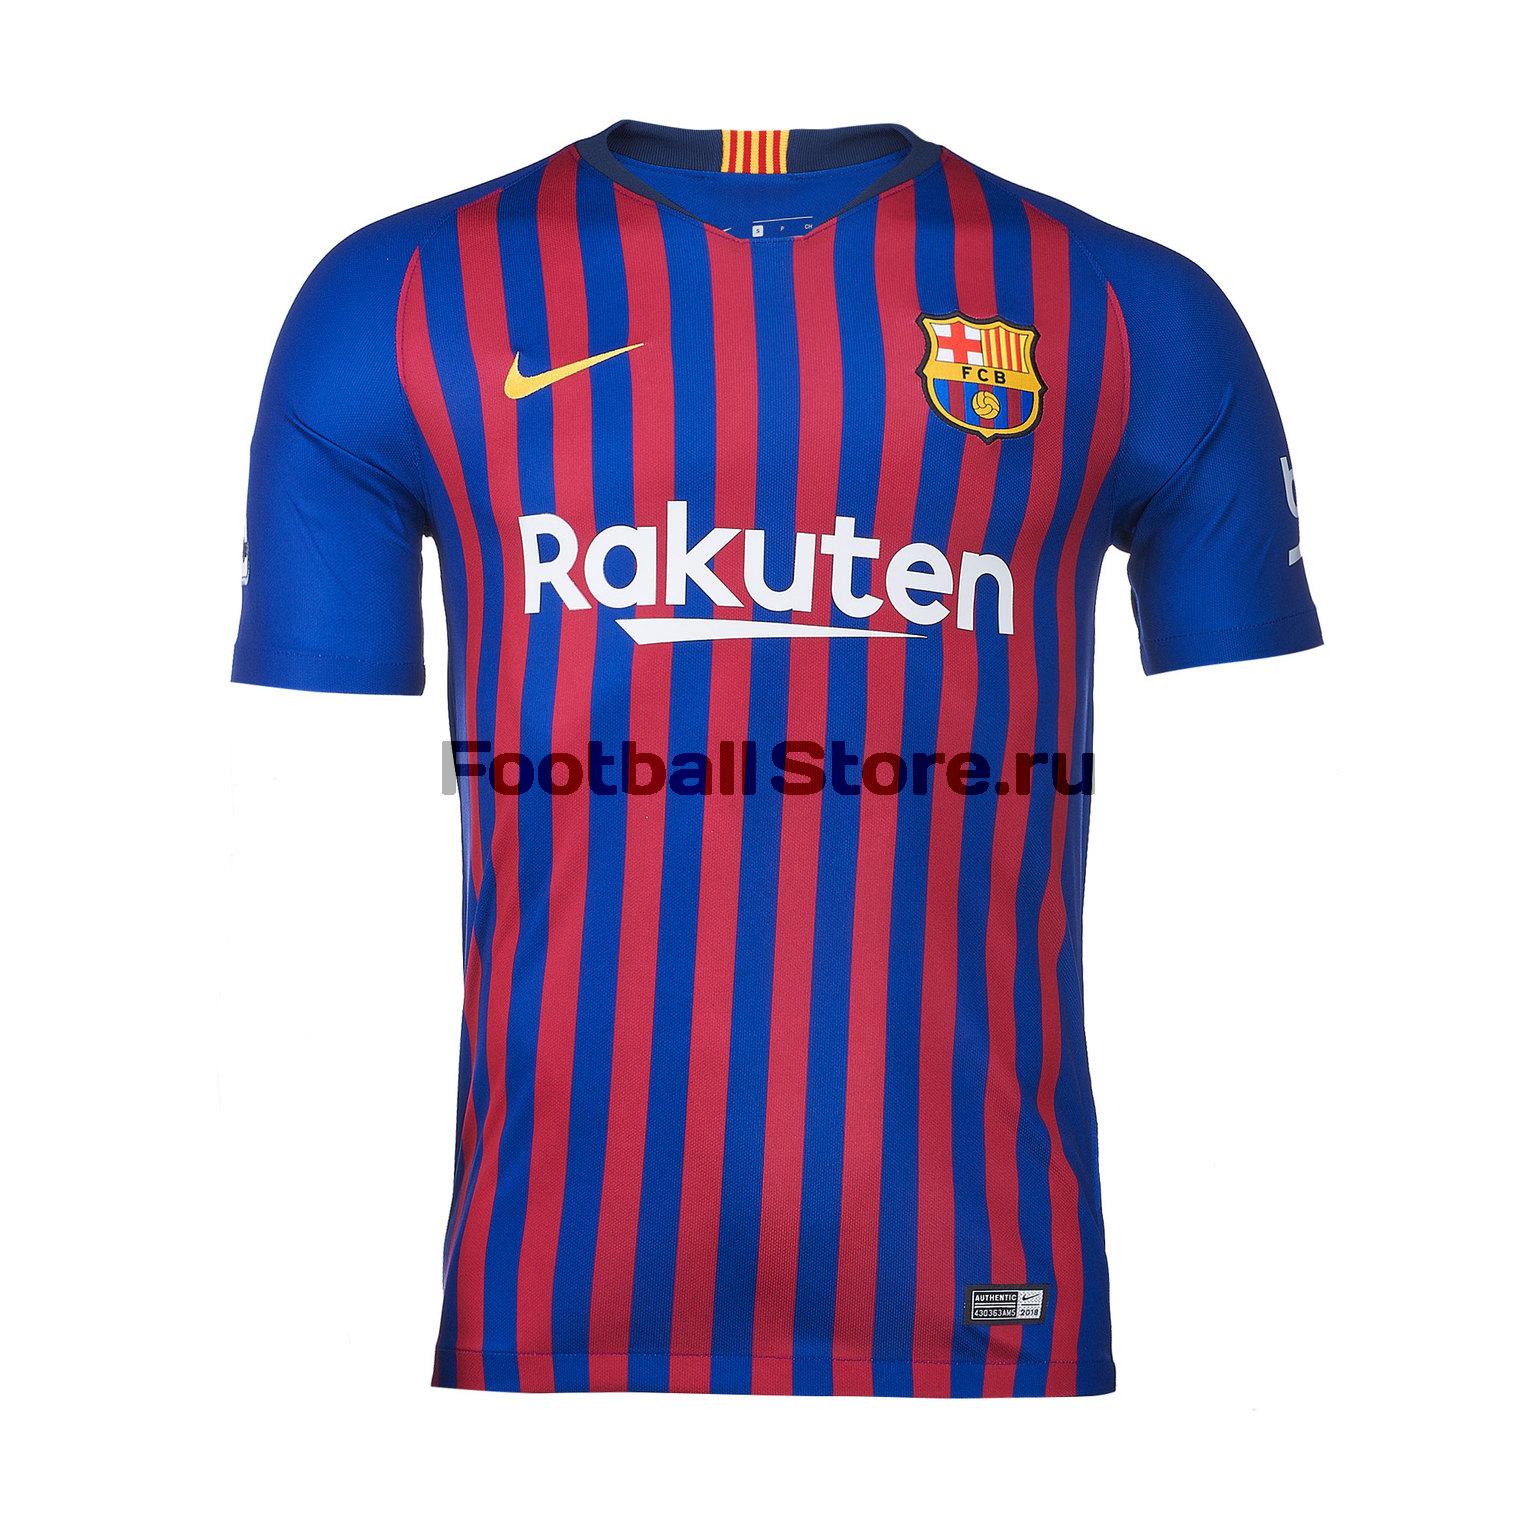 Футболка игровая Nike Barcelona Home 2018/19